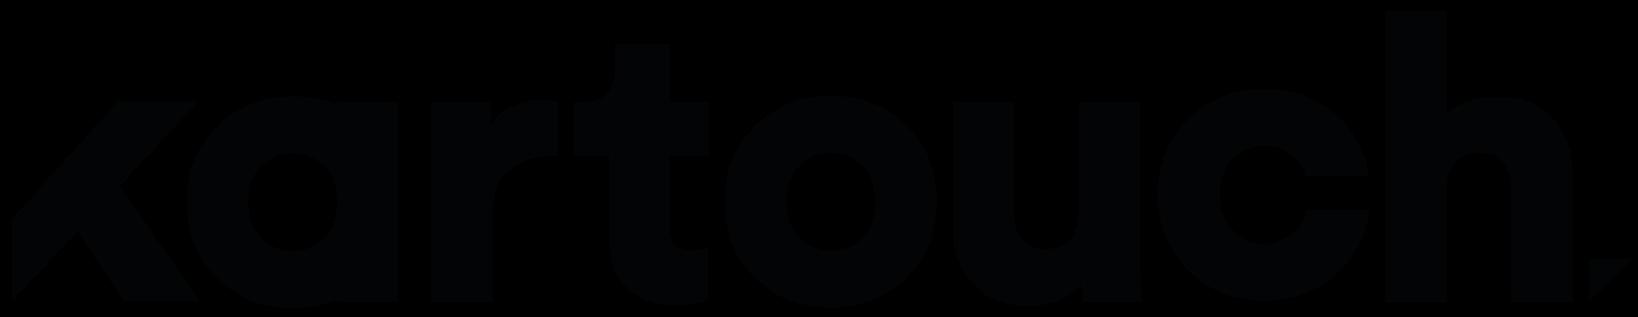 Kartouch logo